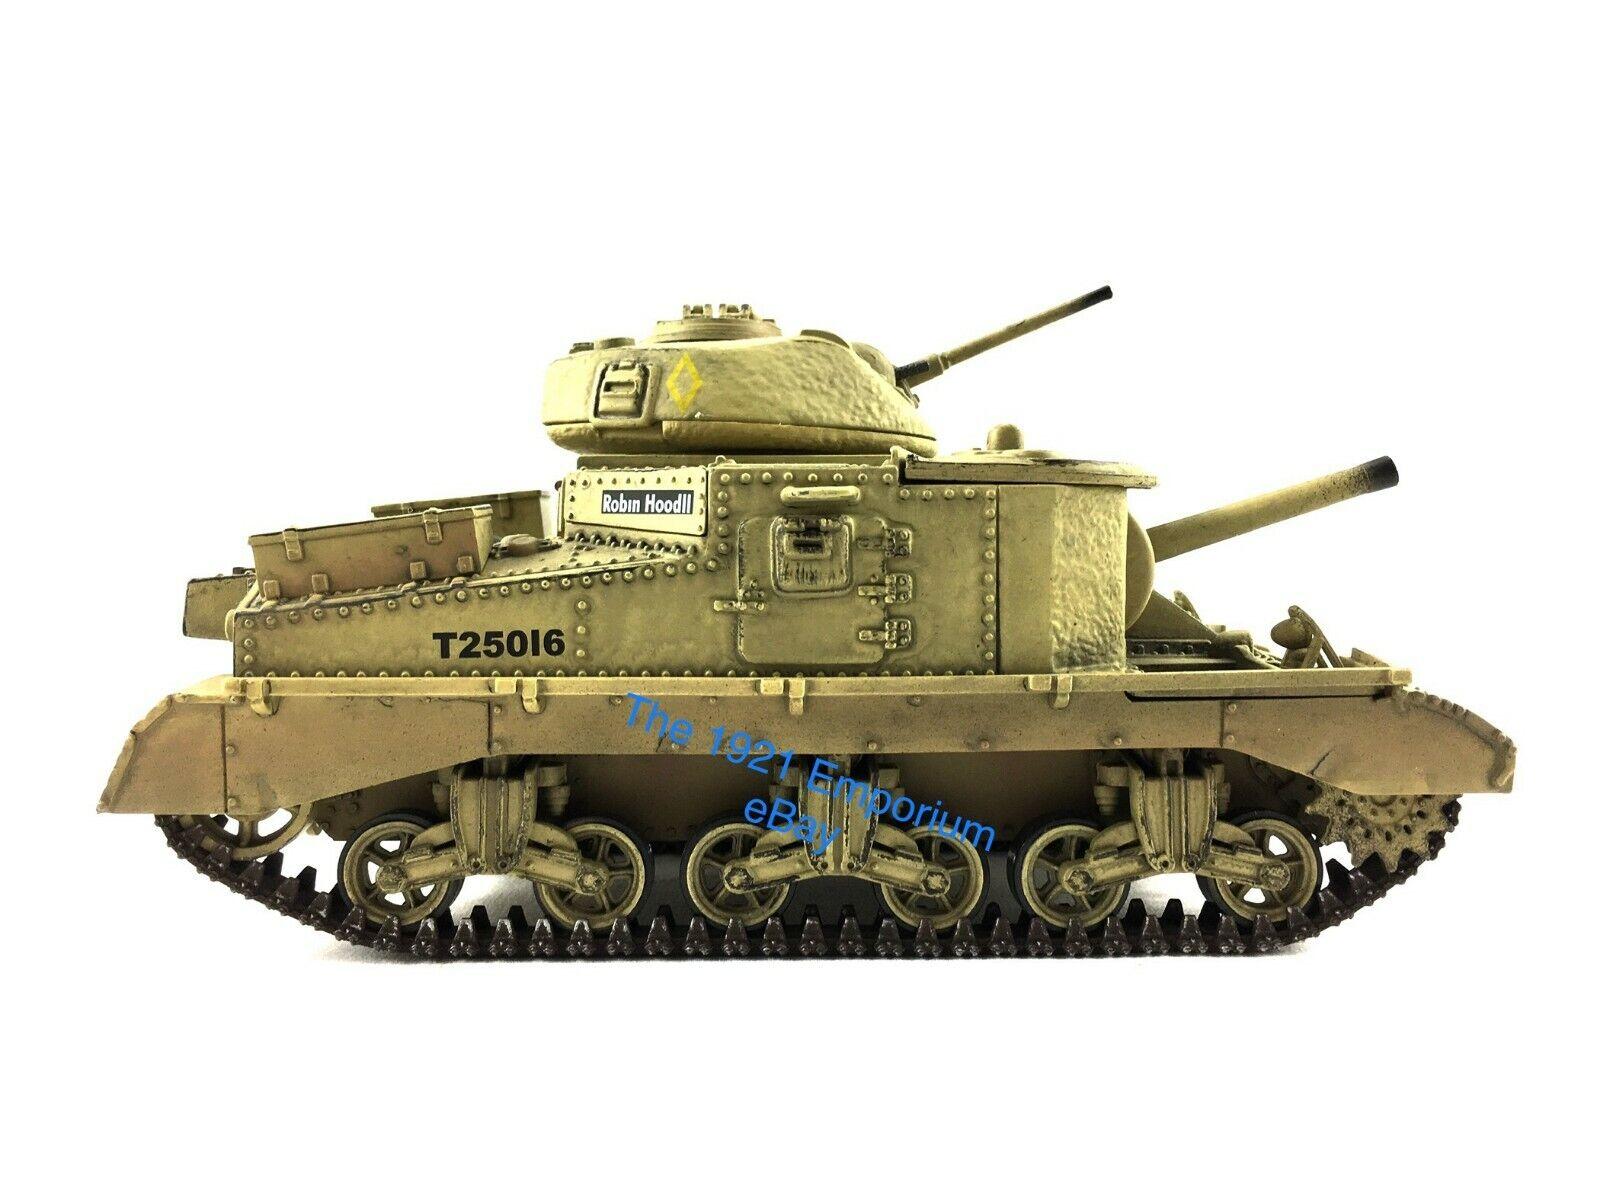 1 32 Diecast Unimax Toys Forces of Valor British M3 Grant Tank North Africa